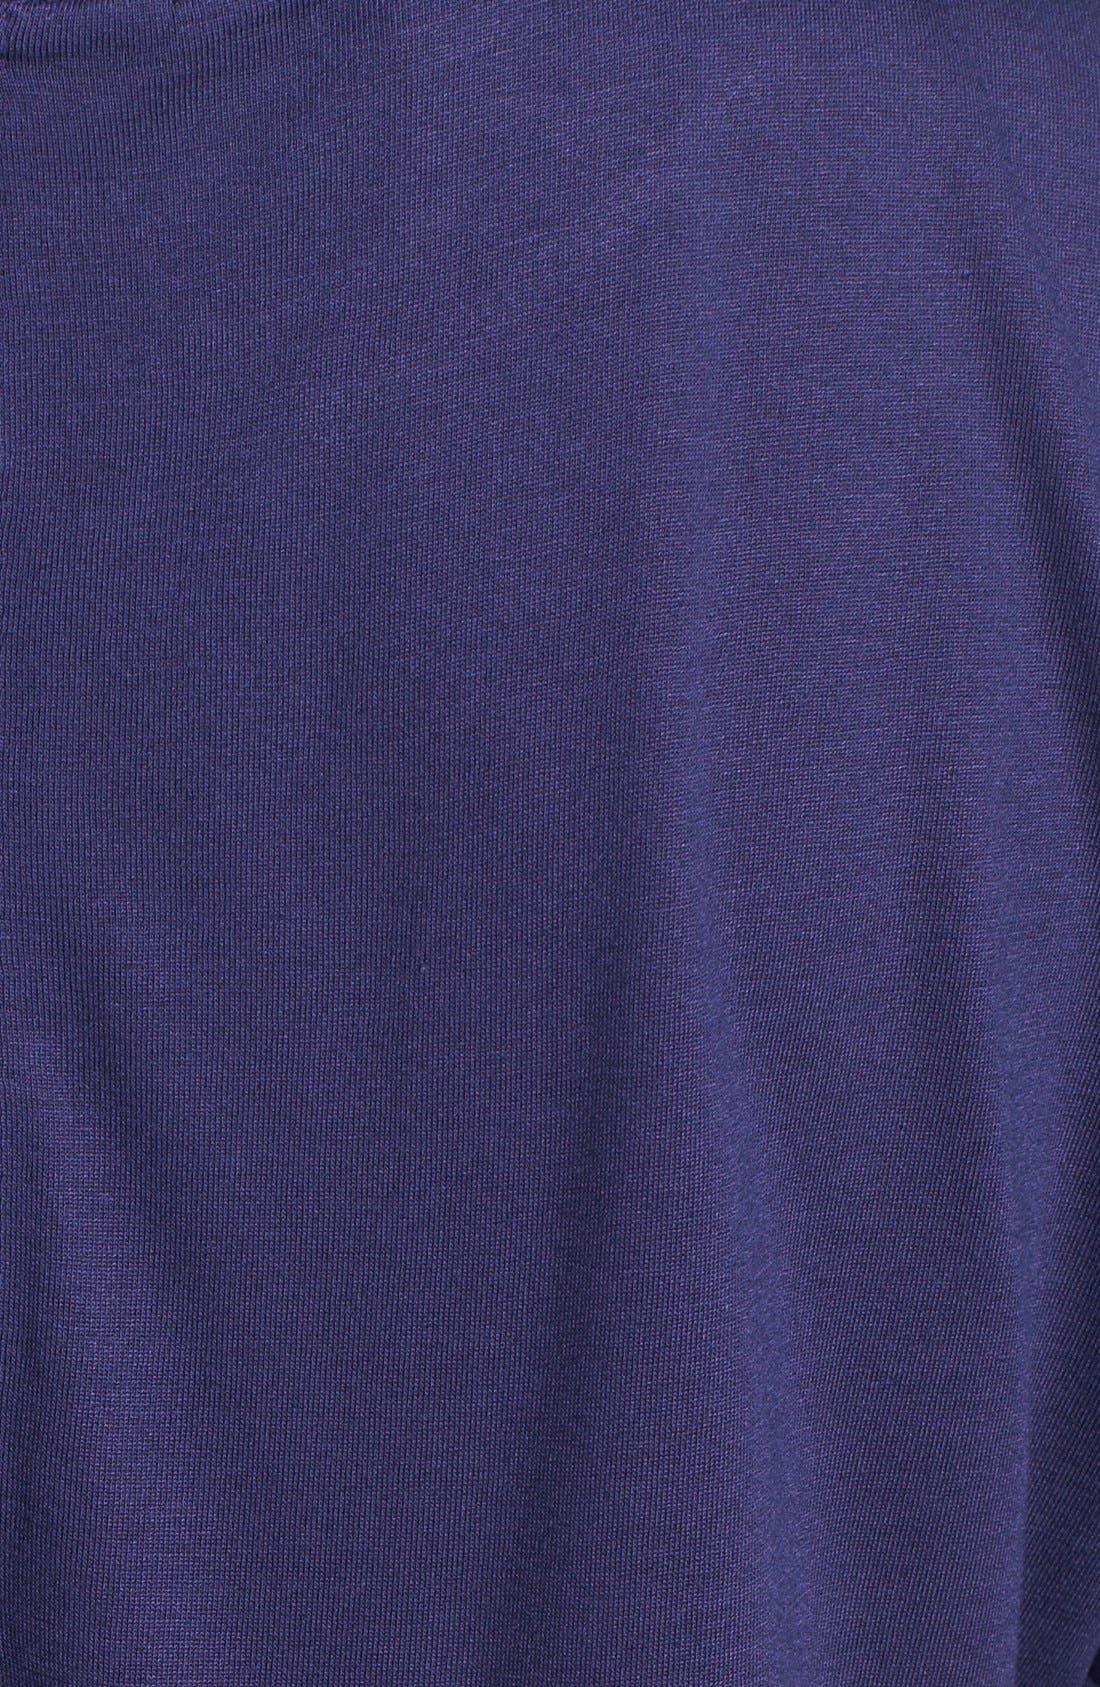 Alternate Image 3  - Halogen® Faux Leather Pocket Tee